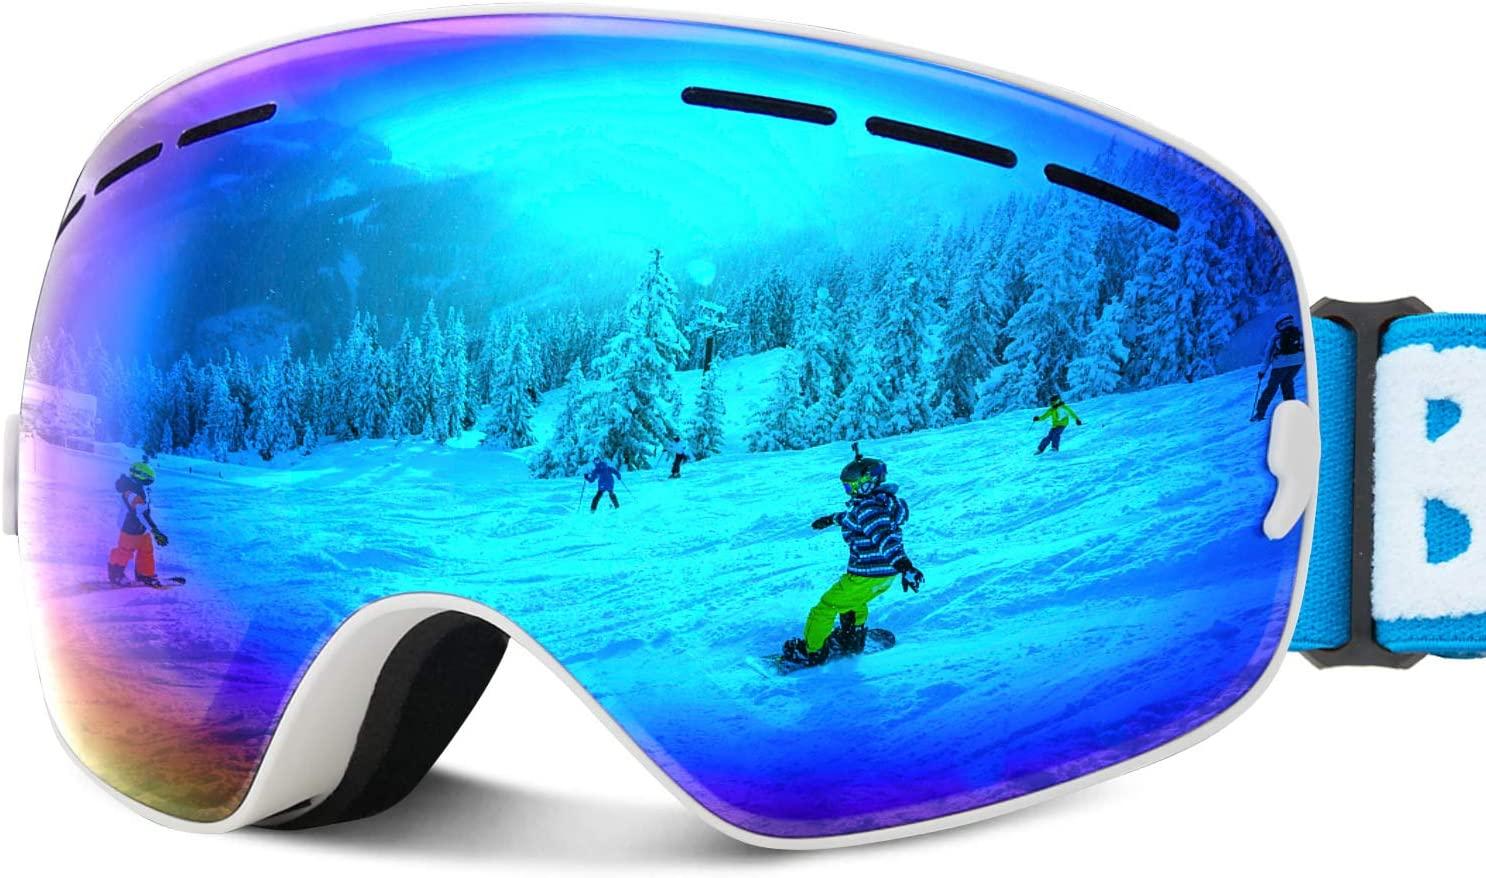 JOJO LEMON Ski Goggles for Kids Over Glasses Boys Girls Snow Sport Goggle Child Snowboarding Clear